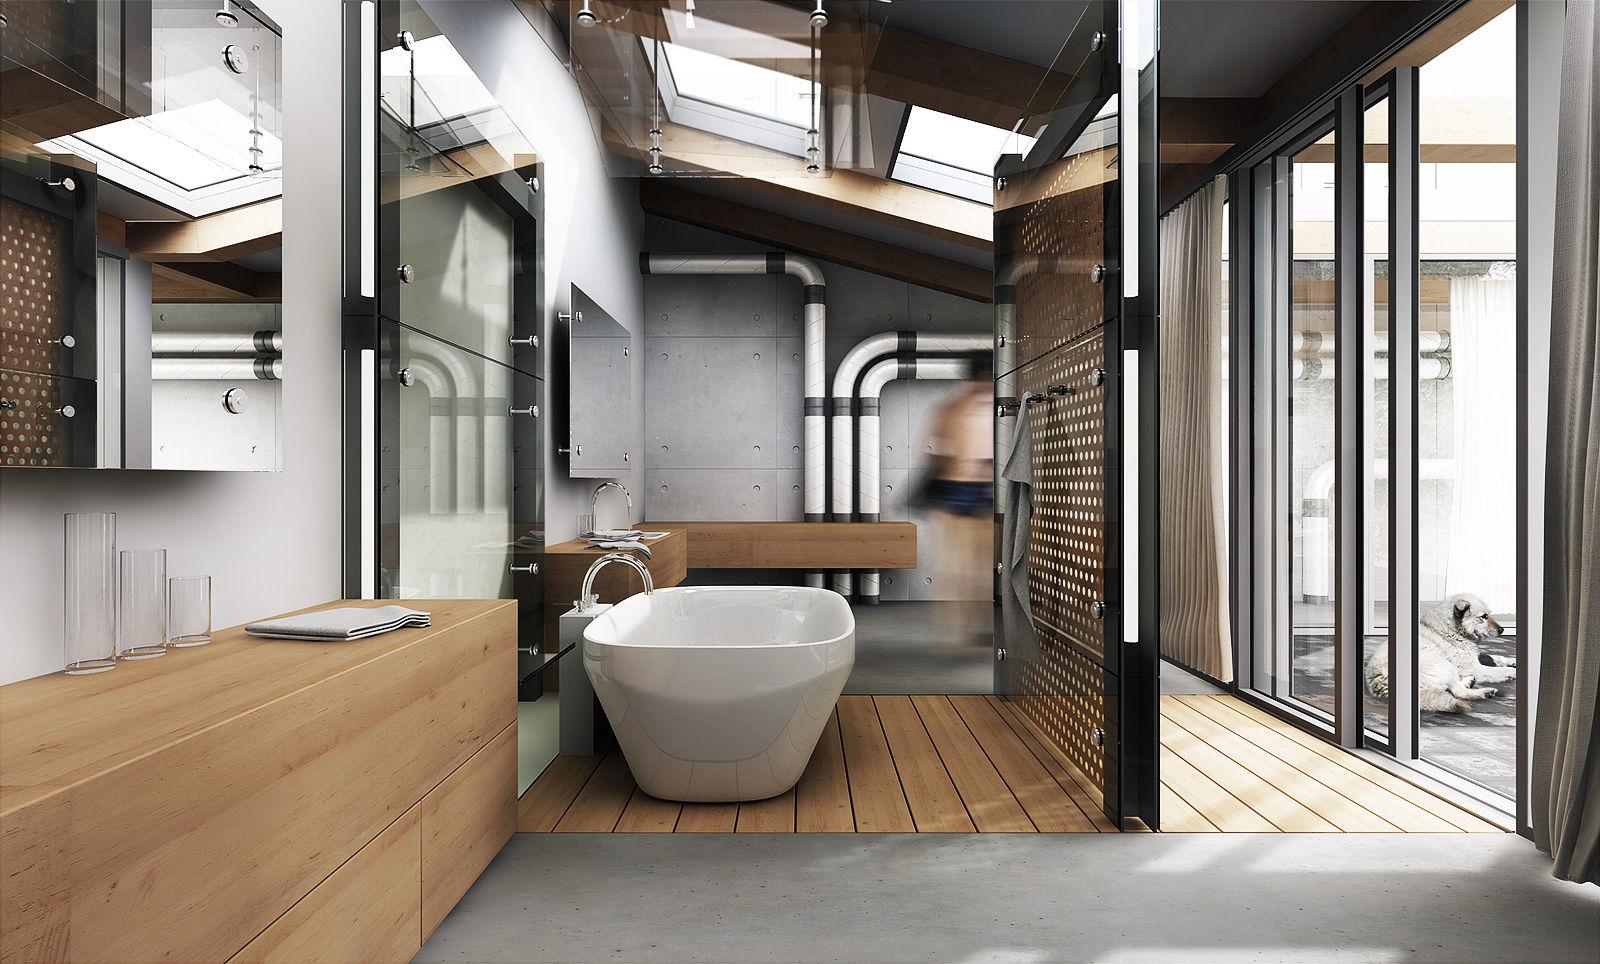 Bathroom Ideas: Industrial Design 94a7dc146ff2f83a466d0d77330909b0